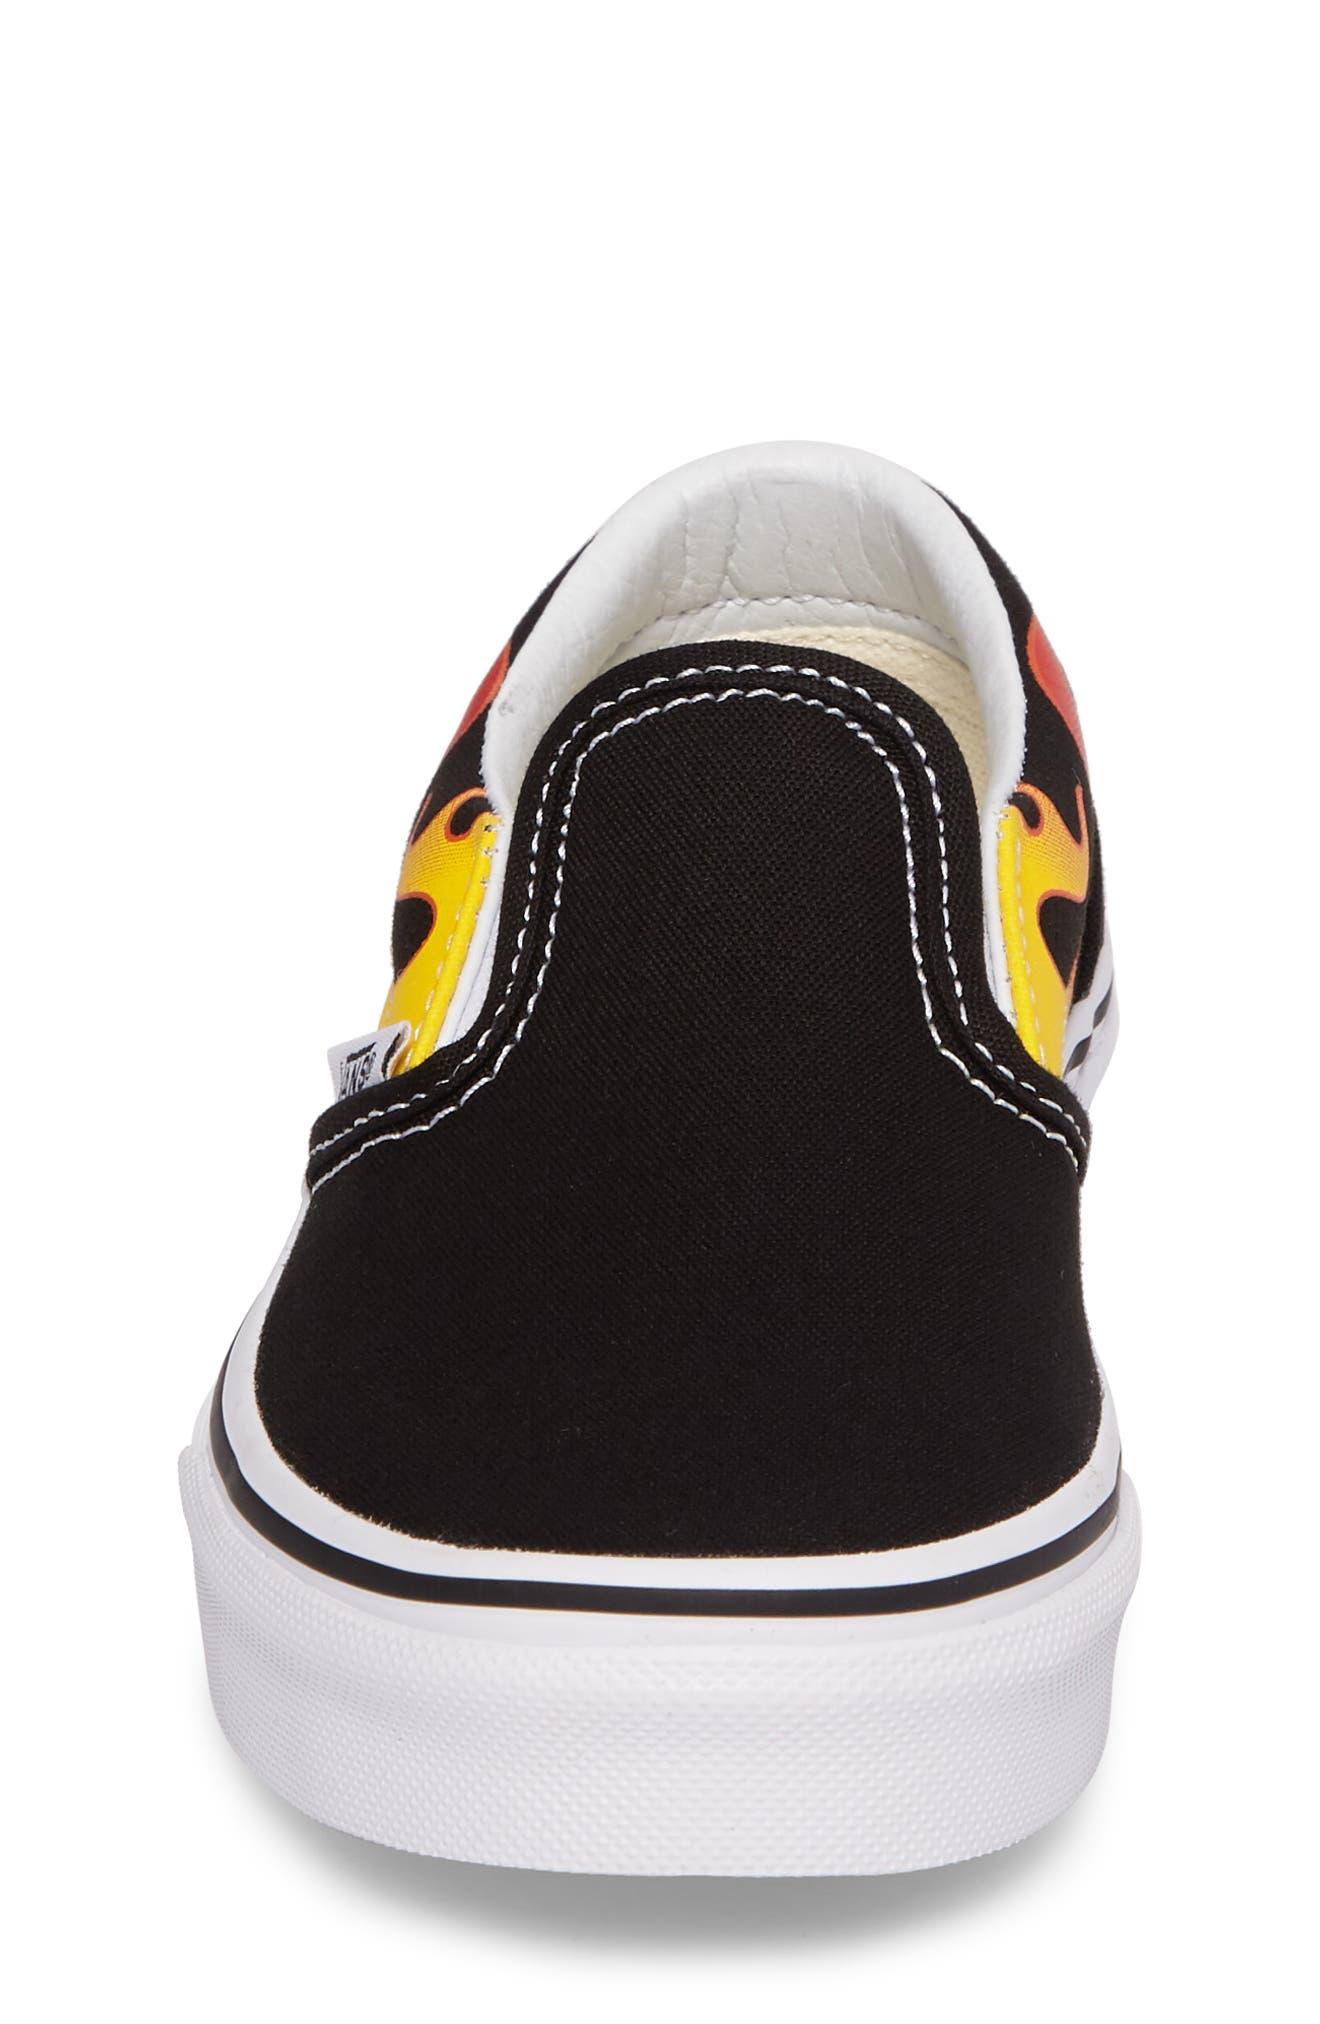 Flame Classic Slip-On Sneaker,                             Alternate thumbnail 4, color,                             002